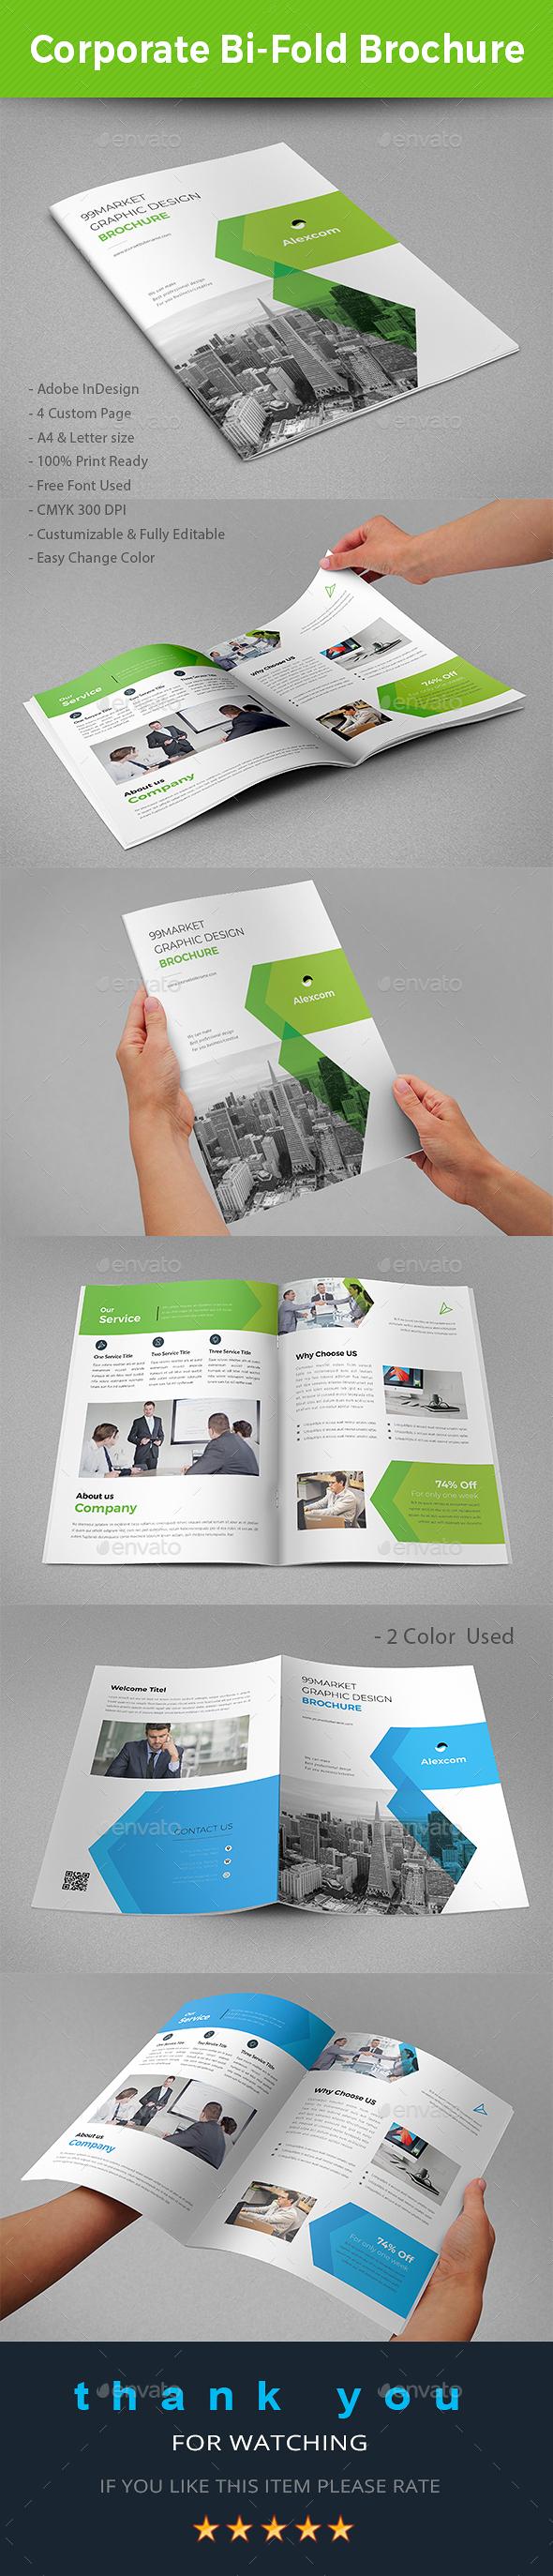 Bi-Fold Brochure Template - Brochures Print Templates